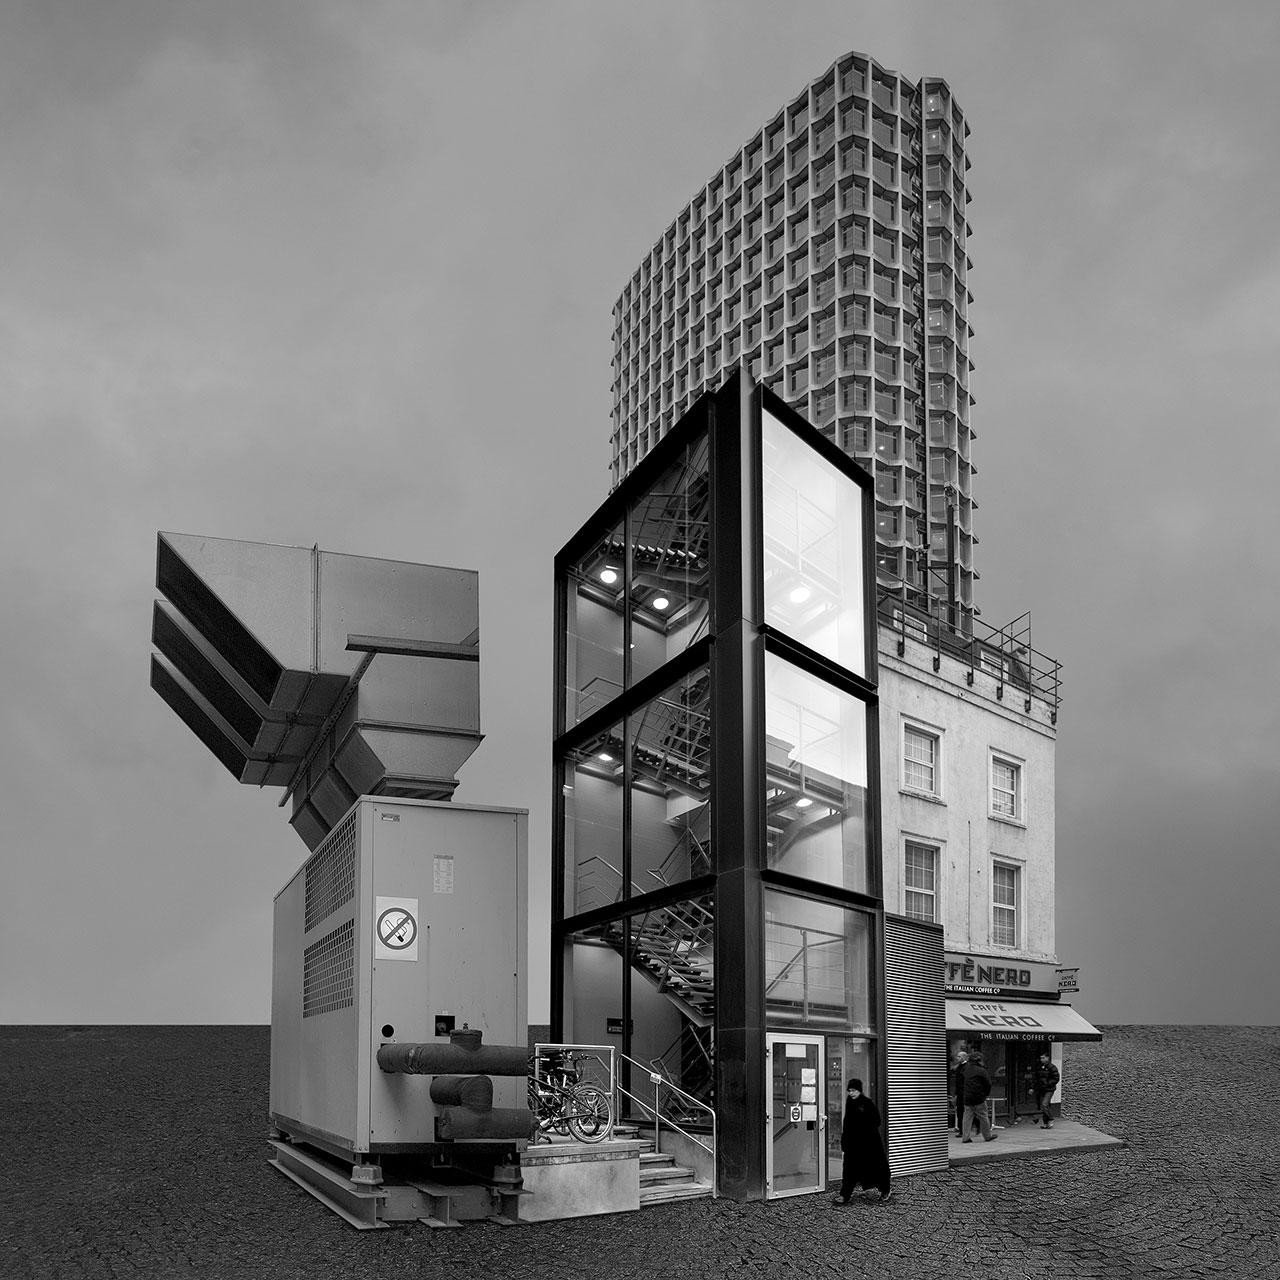 Beomsik Won, Archisculpture 003, 2010. Archival pigment print, 50x50cm.